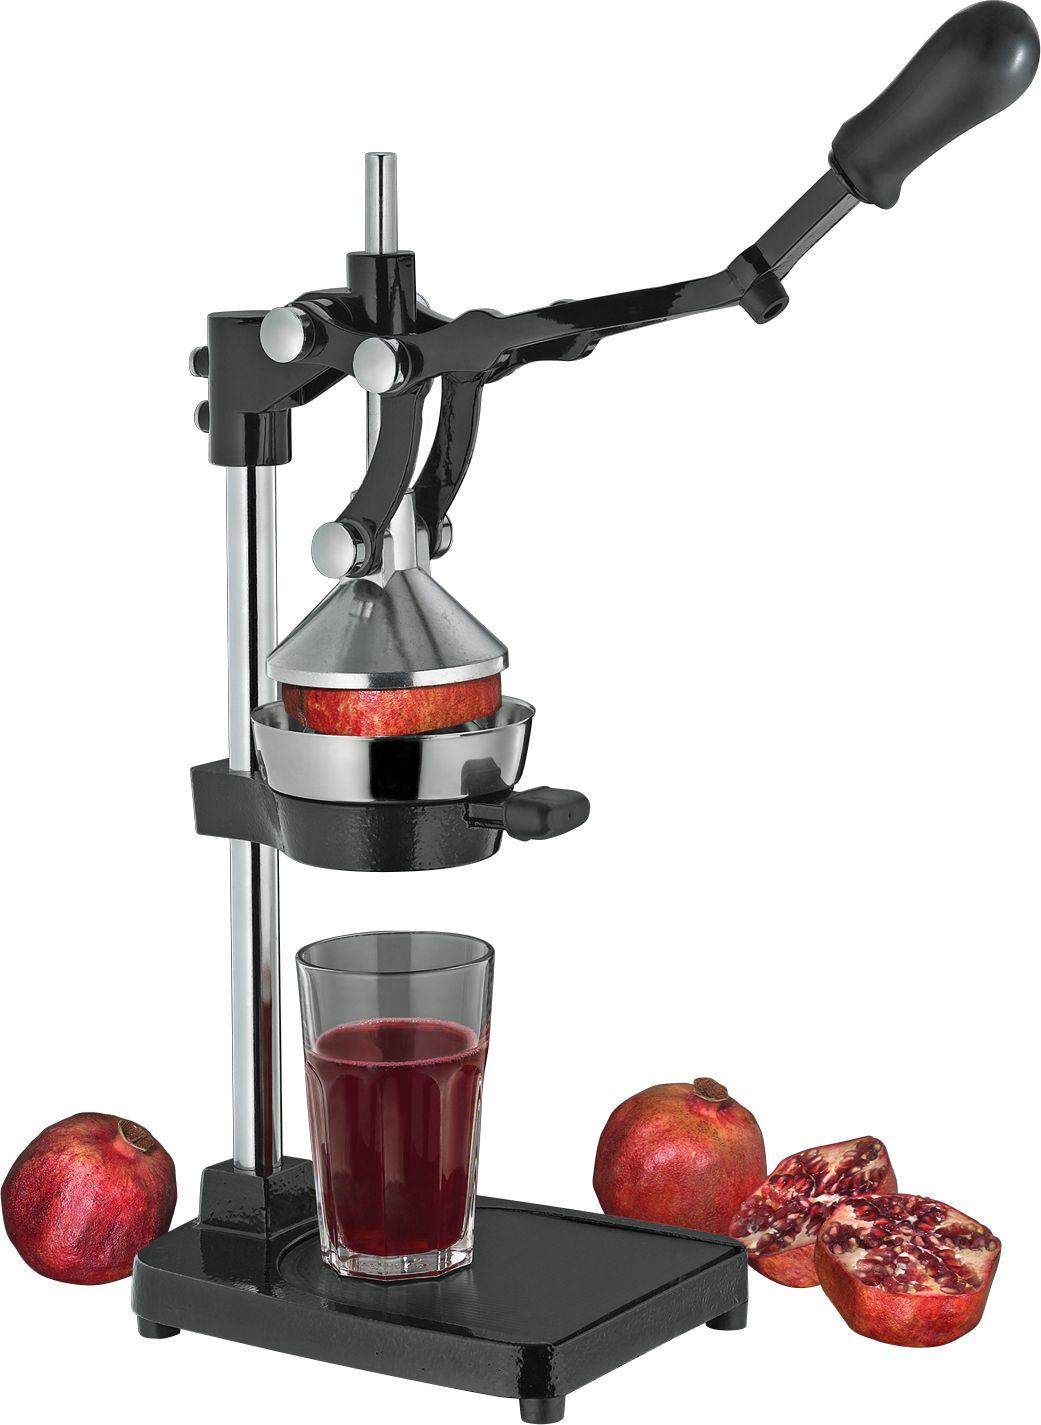 Pomegranate and Citrus Juicer